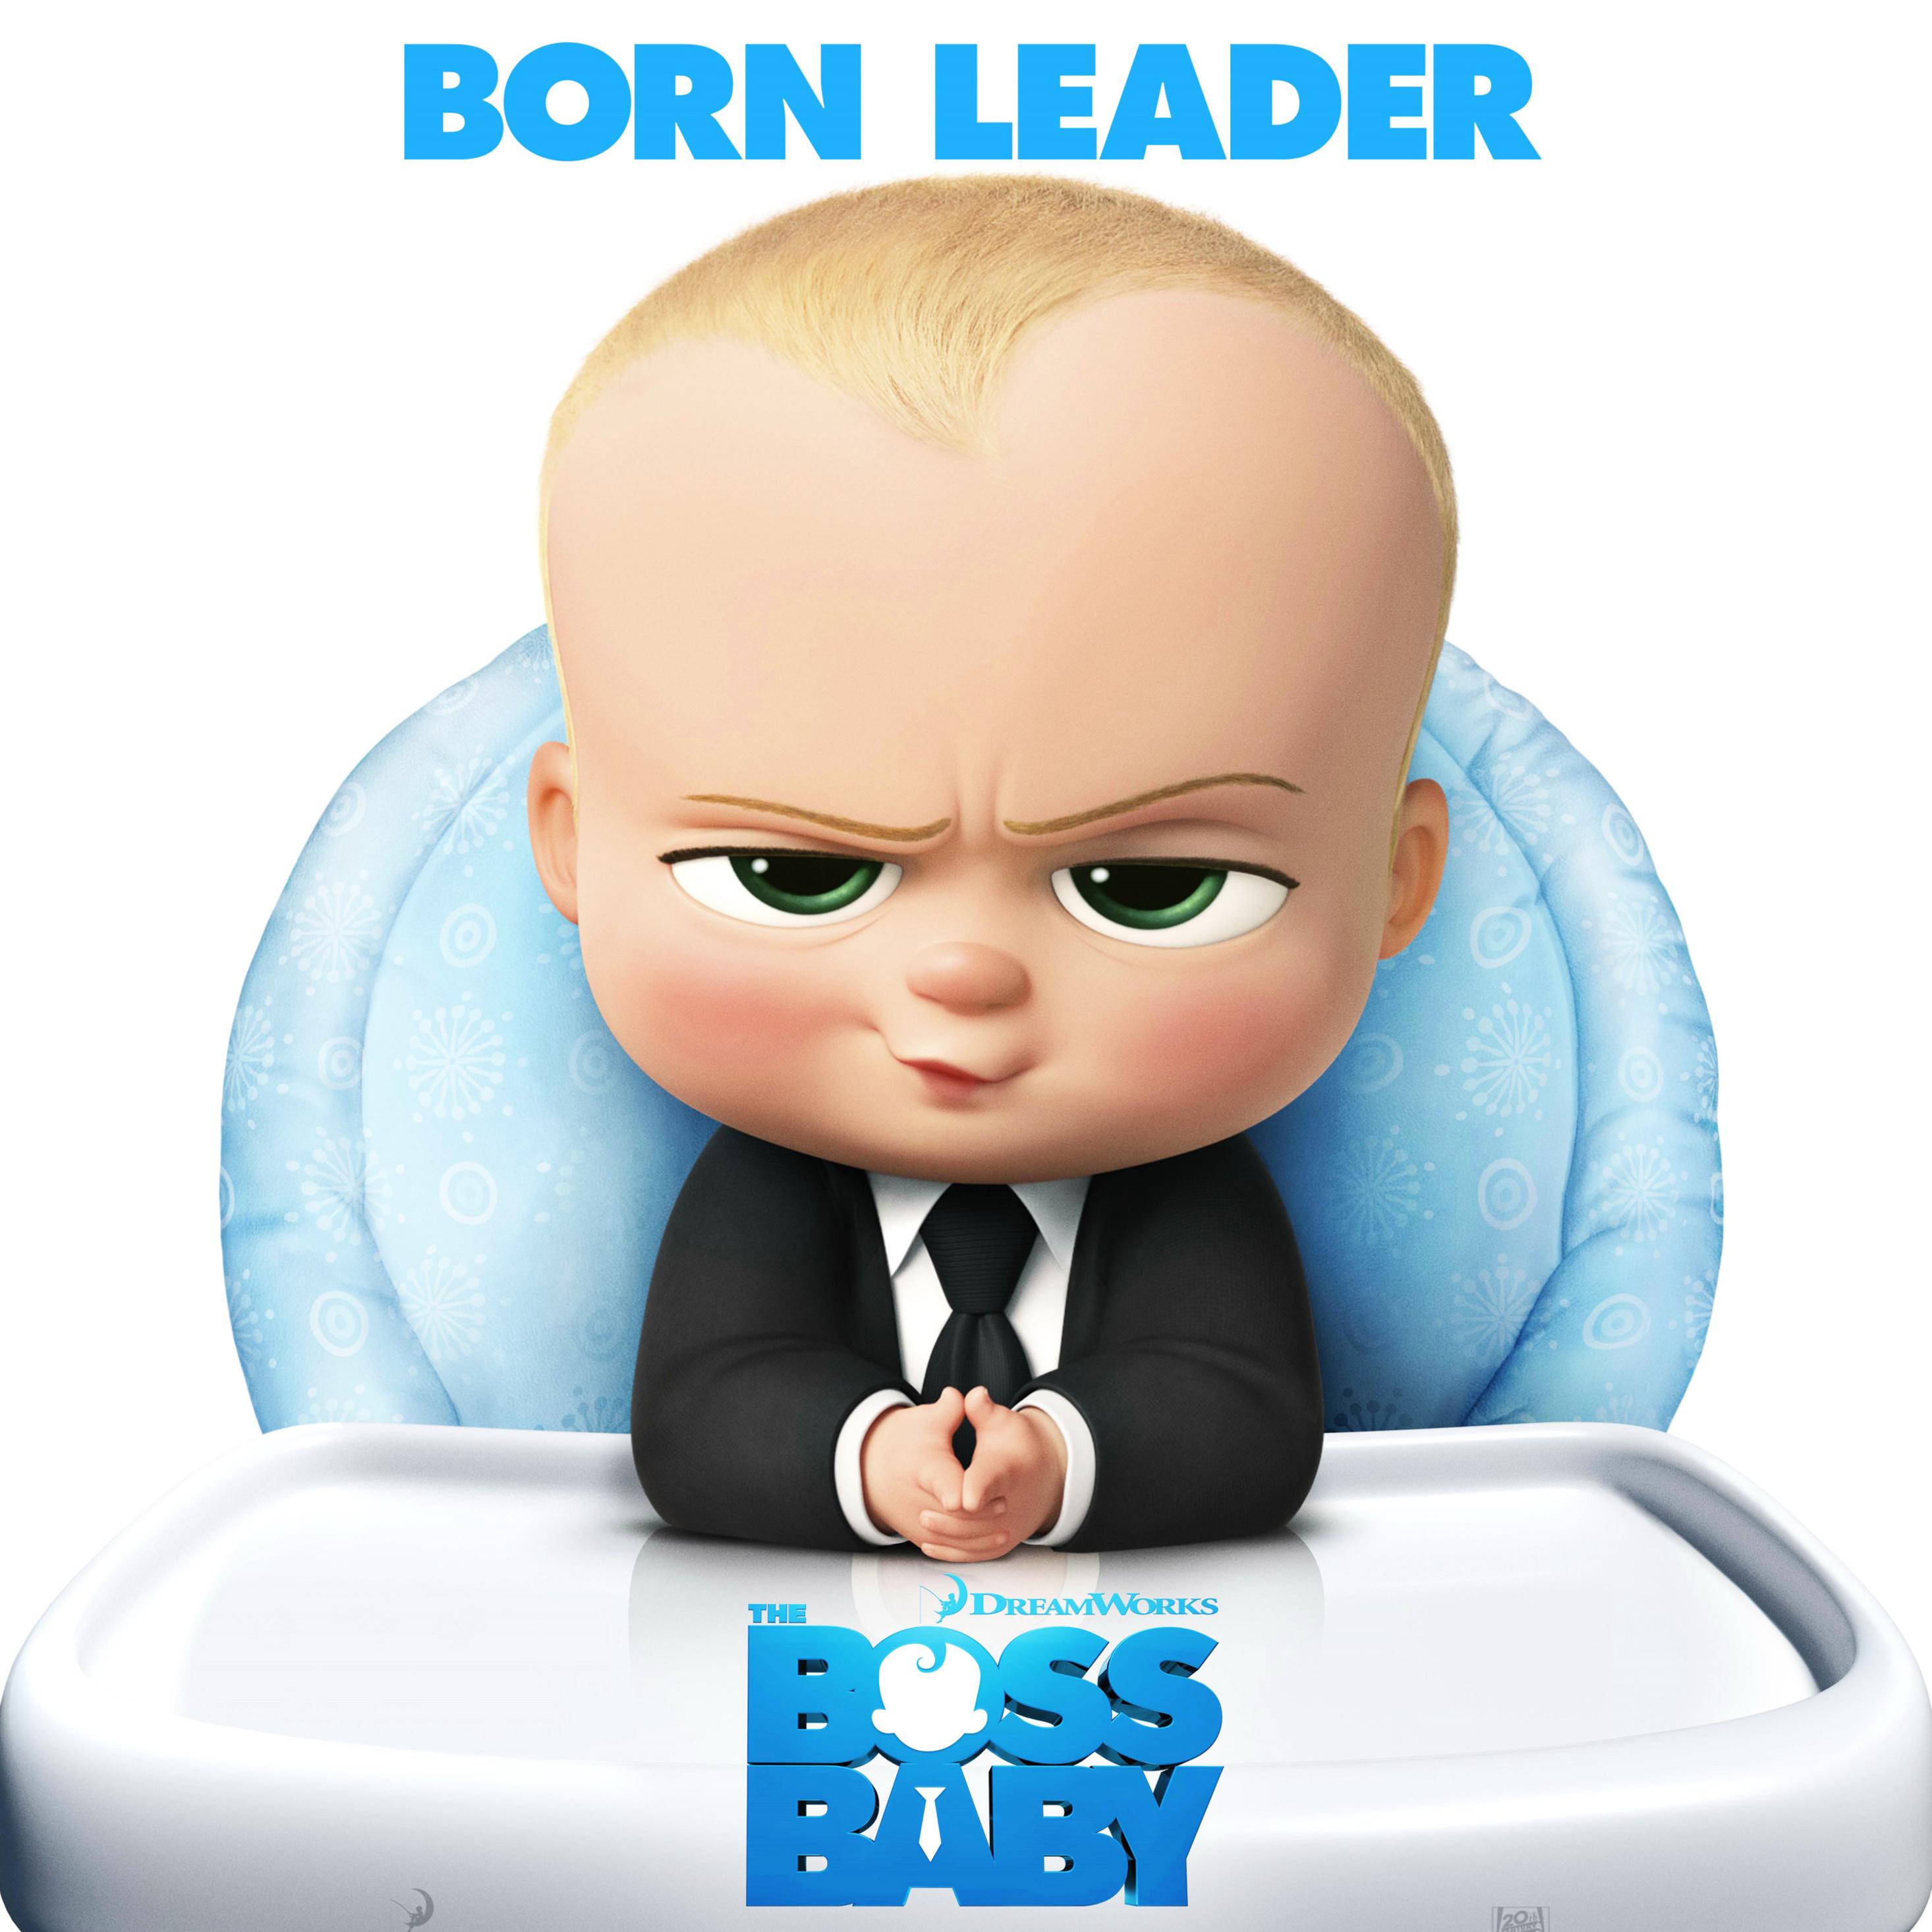 2932x2932 The Boss Baby Ipad Pro Retina Display Hd 4k